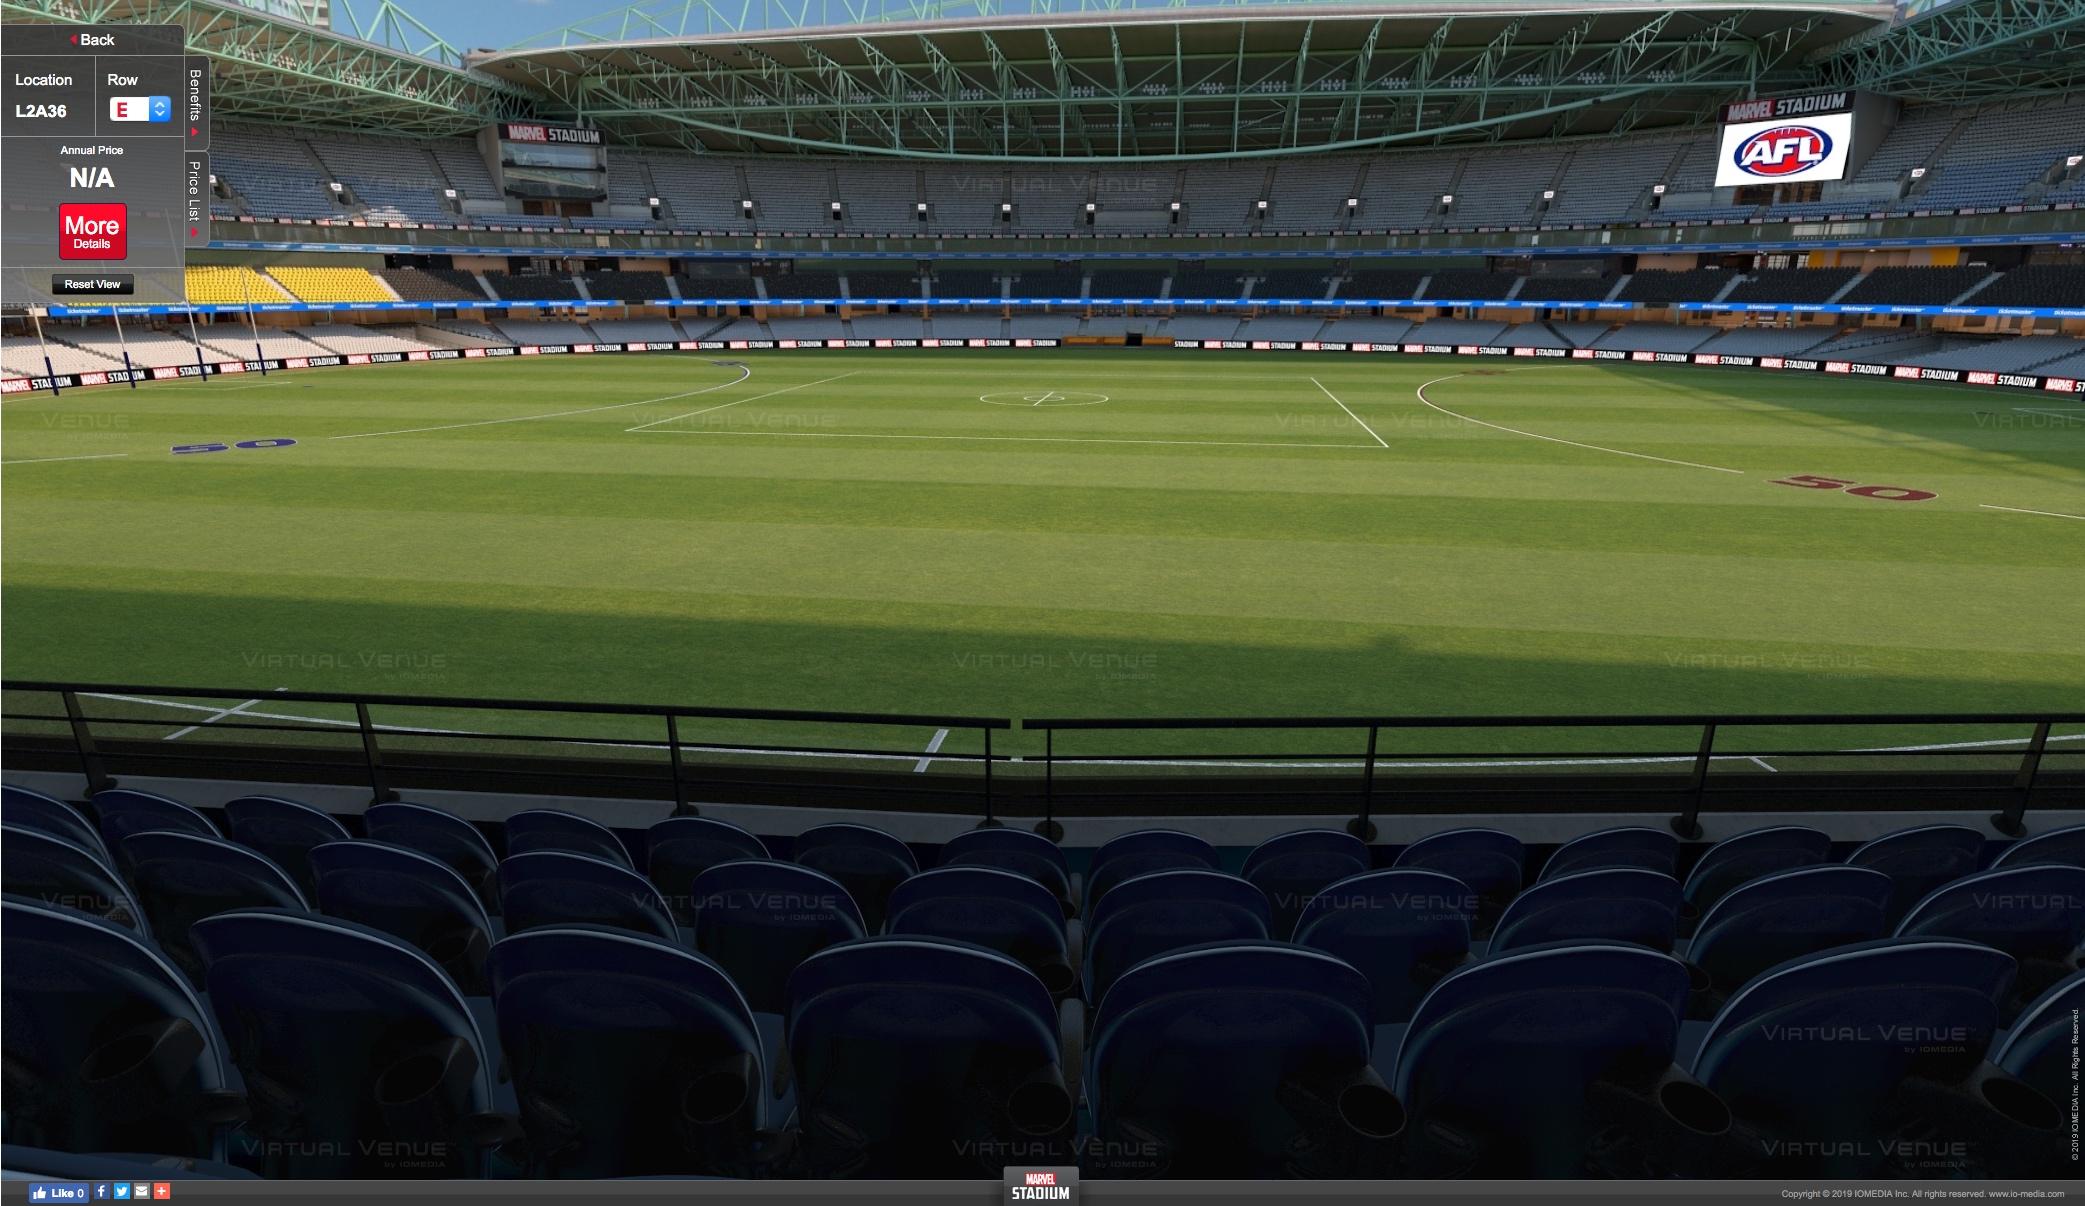 Image Credit - Marvel Stadium Centre Wing